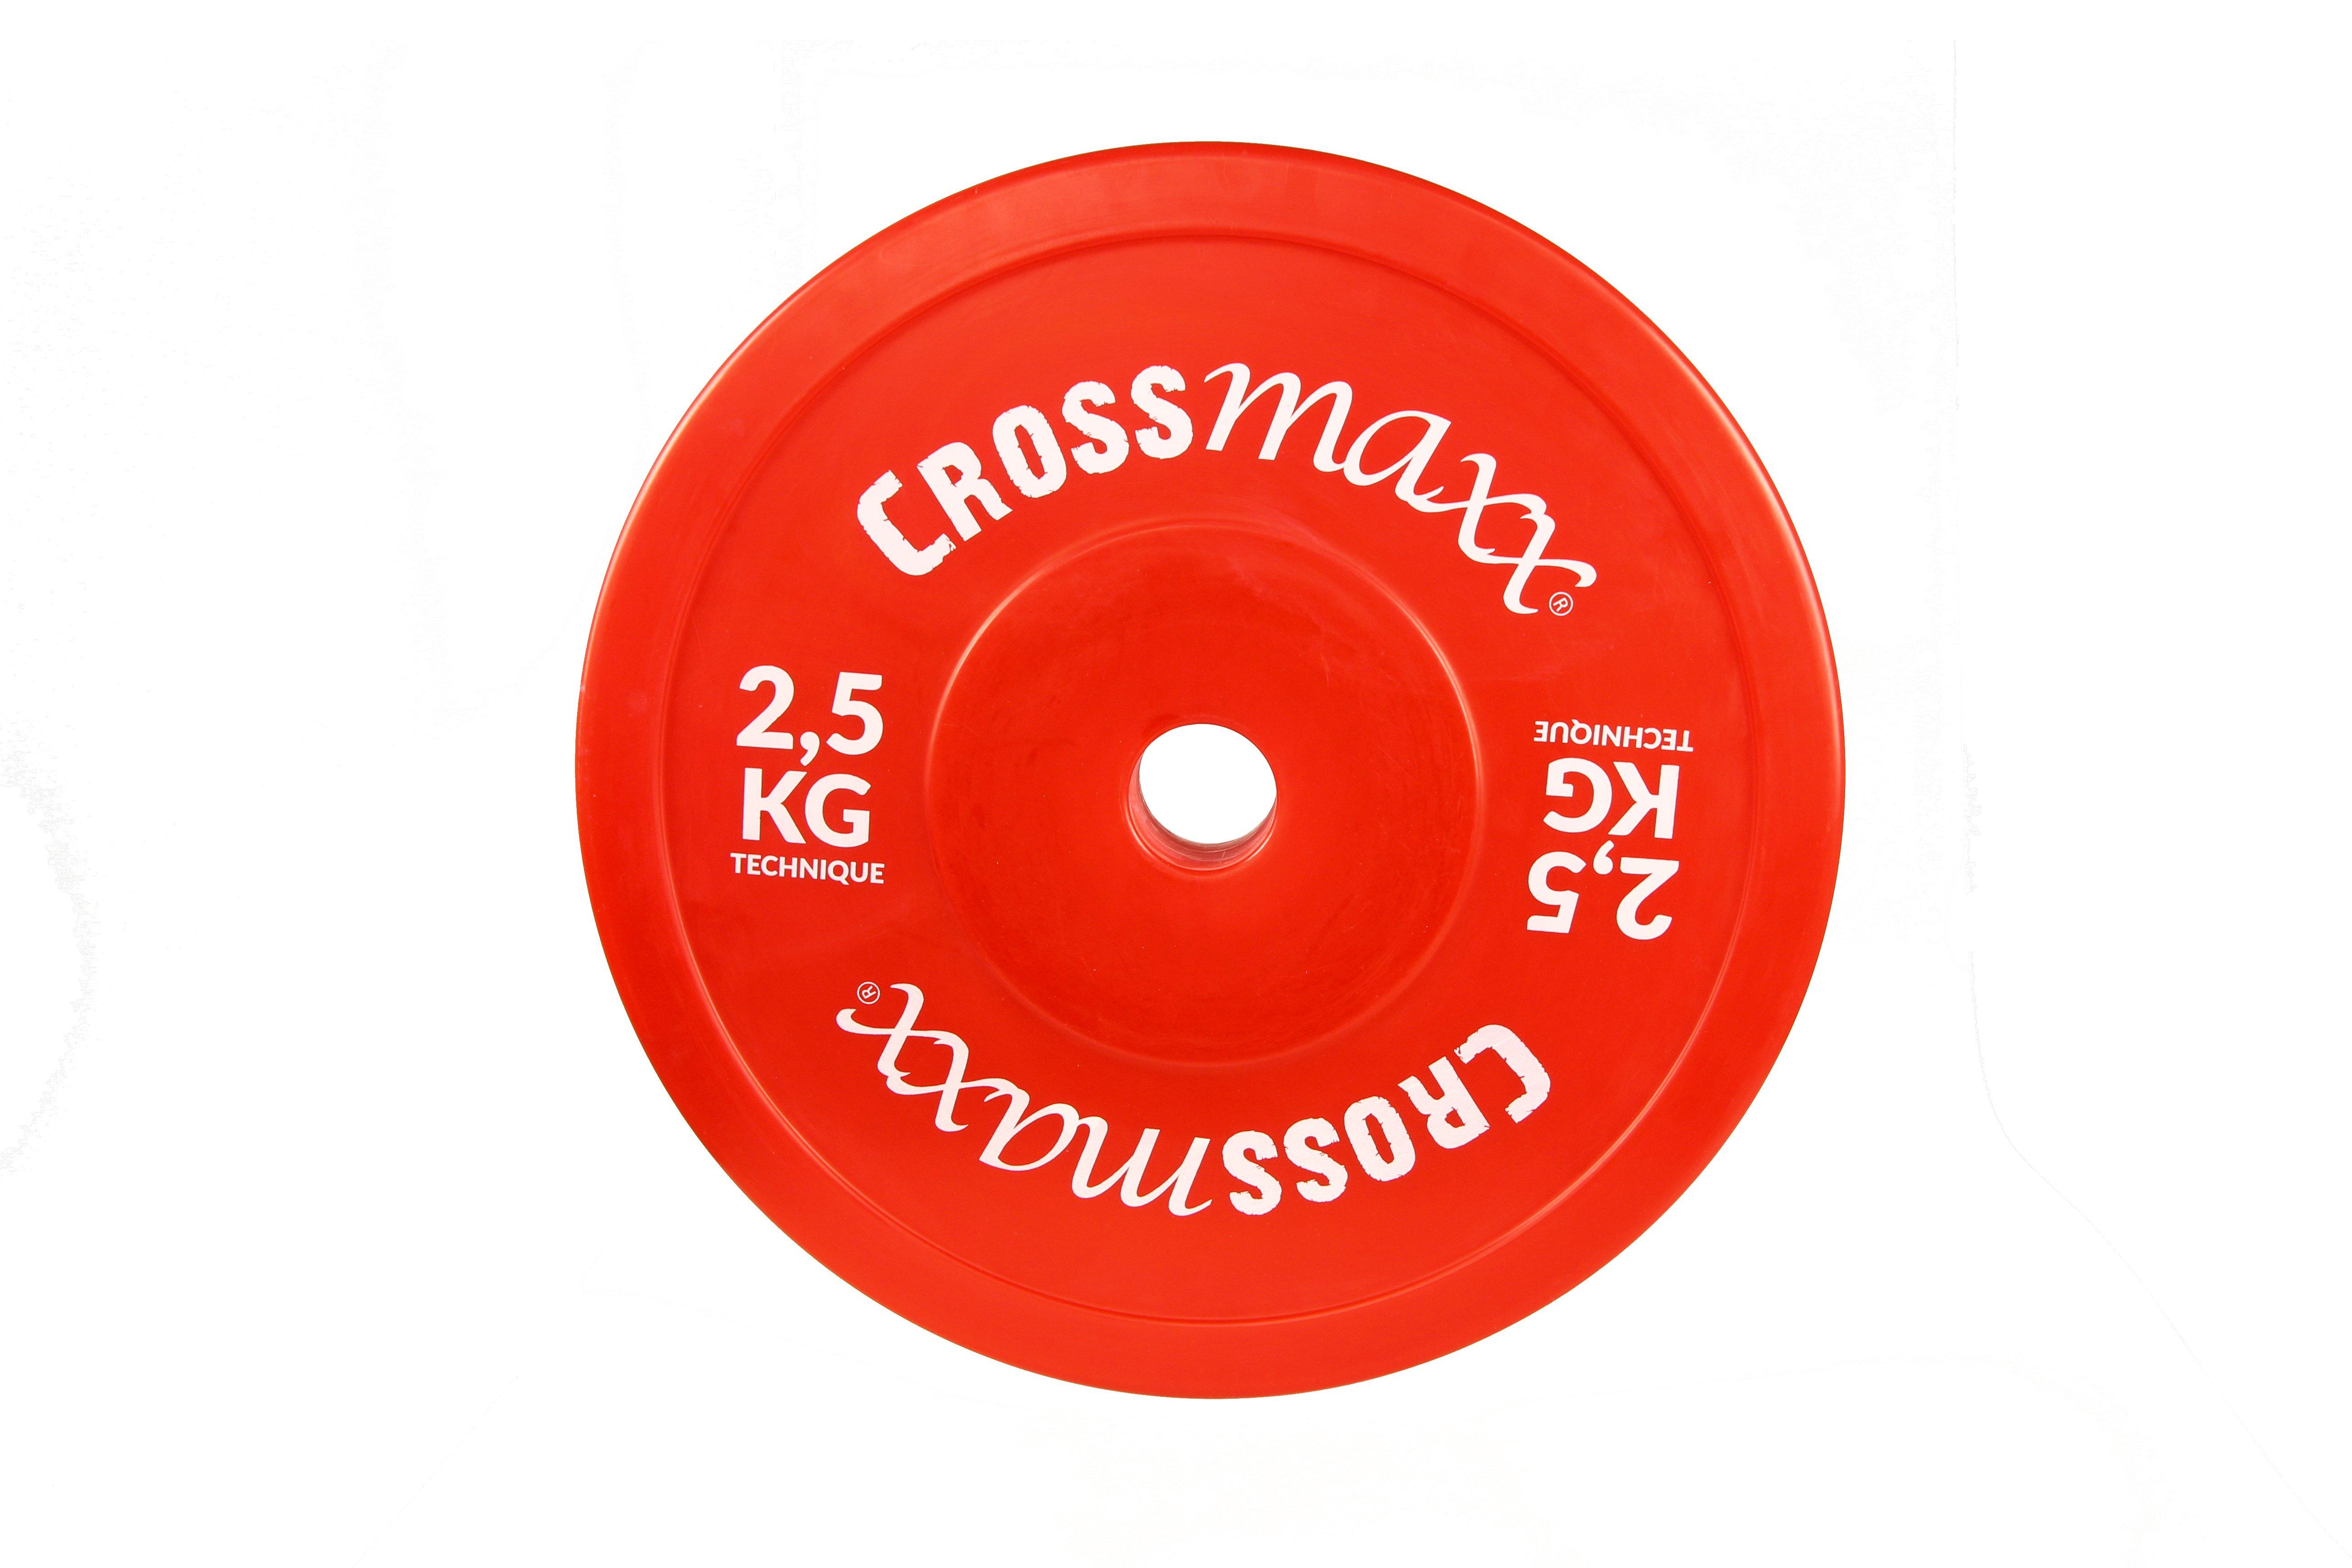 Crossmaxx Hollow Teknik Vægtskive 2,5 kg Red